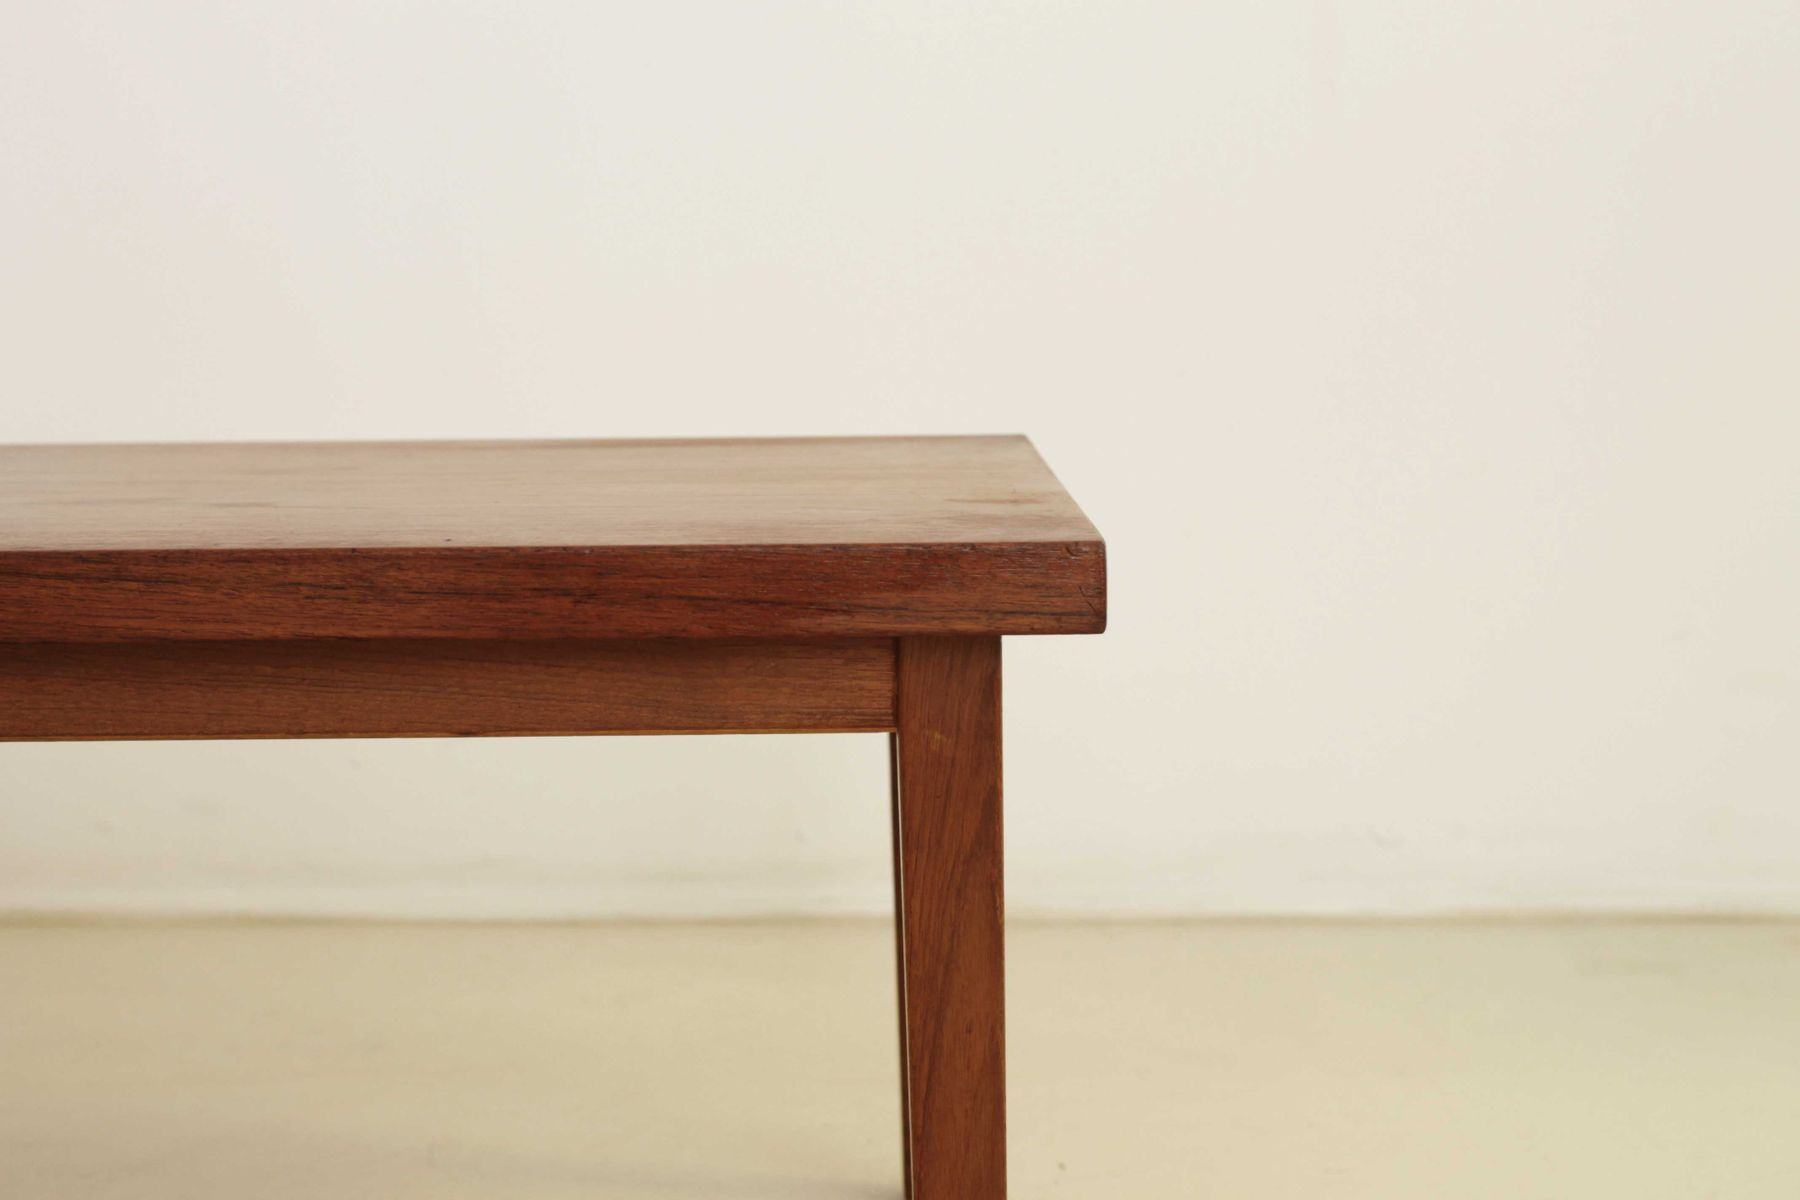 Table basse rectangulaire scandinave en teck 1950s en for Table basse scandinave rectangulaire